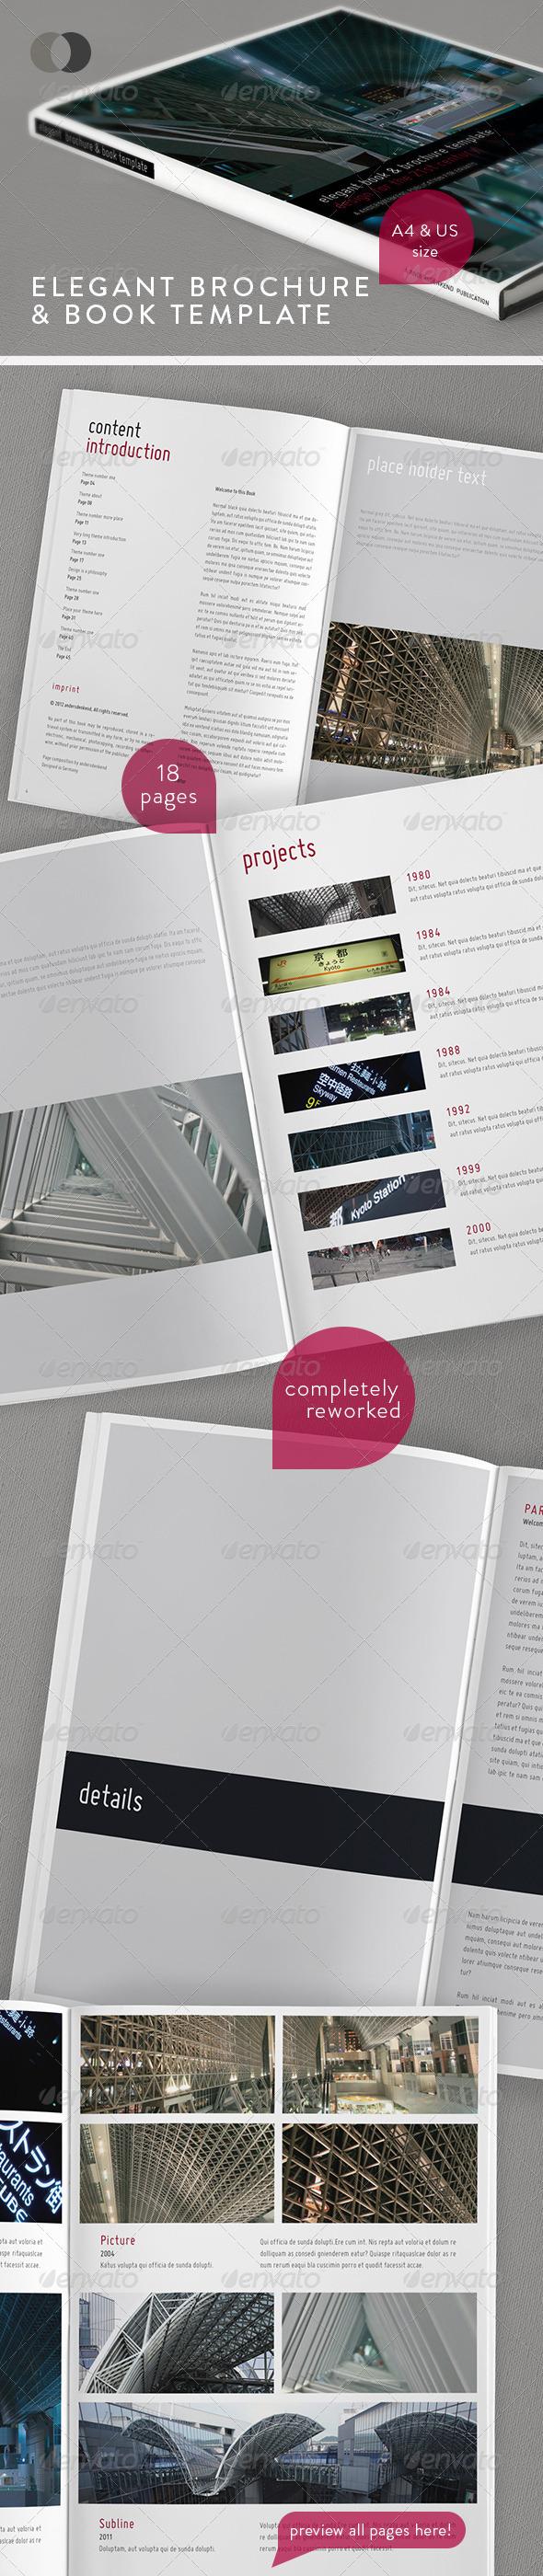 GraphicRiver Book & Brochure Elegant Series Vol.1 222167